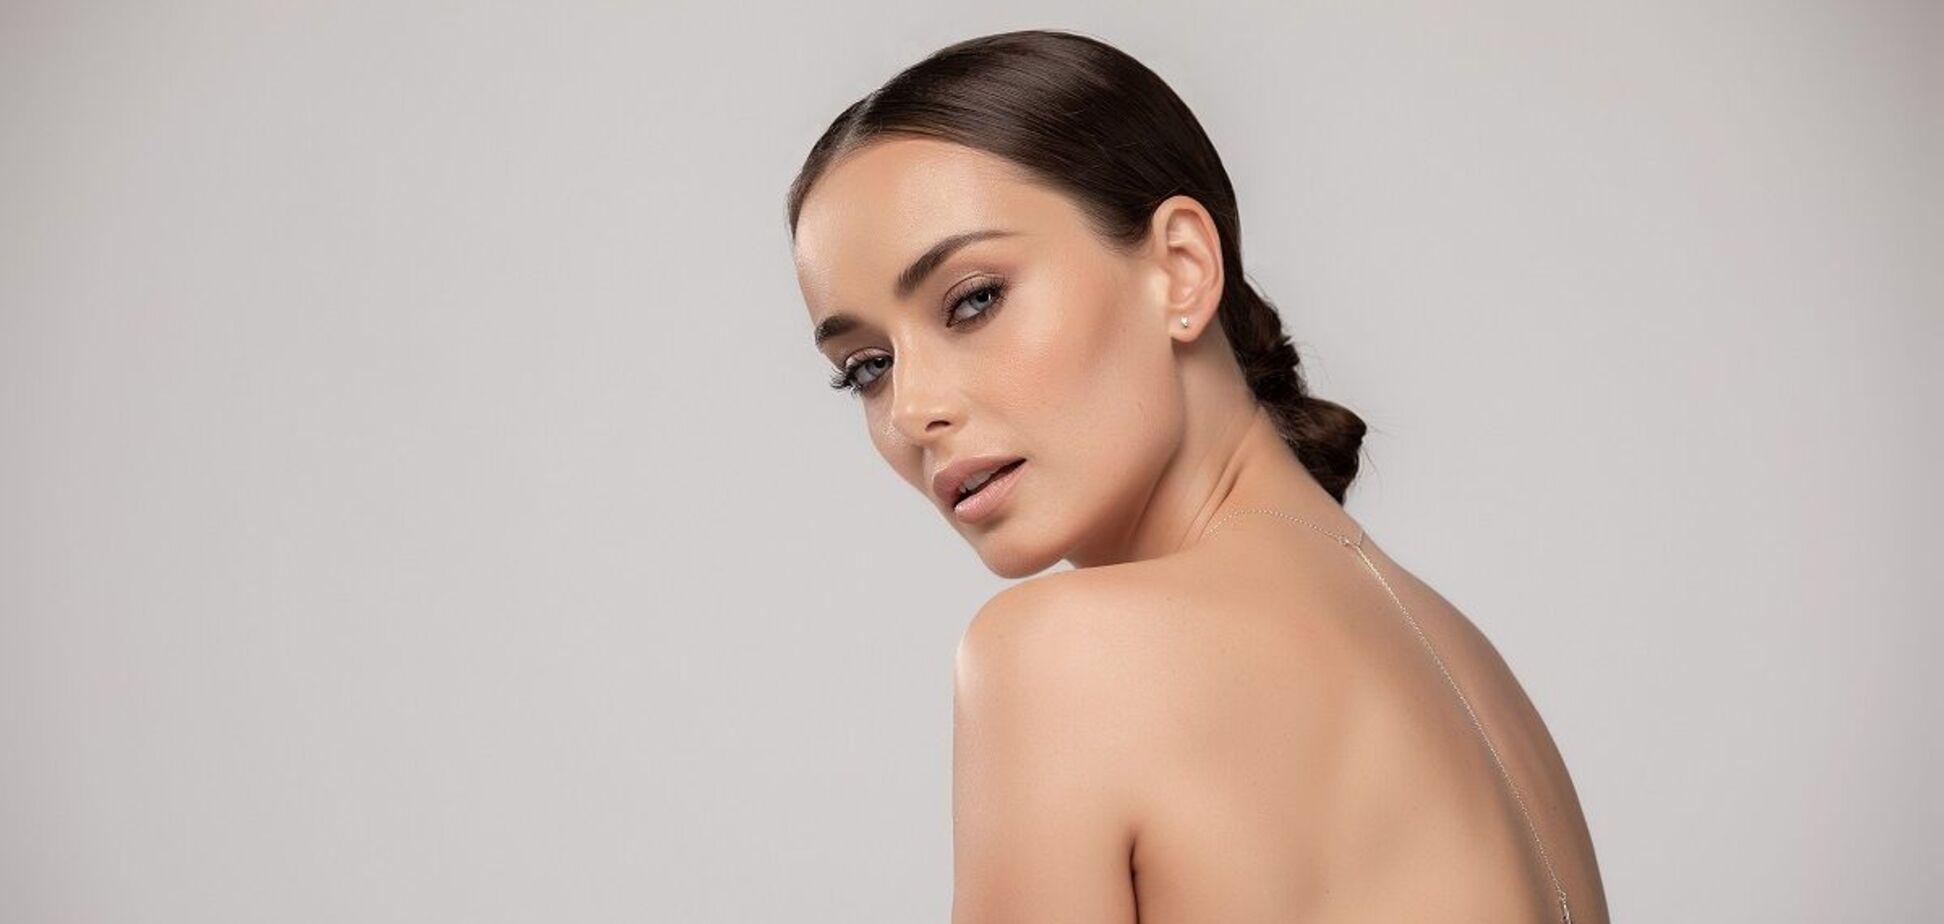 На 'холостячку' Мишину накинулись хейтеры из-за возвращения в 'Танці з зірками': актриса дала отпор